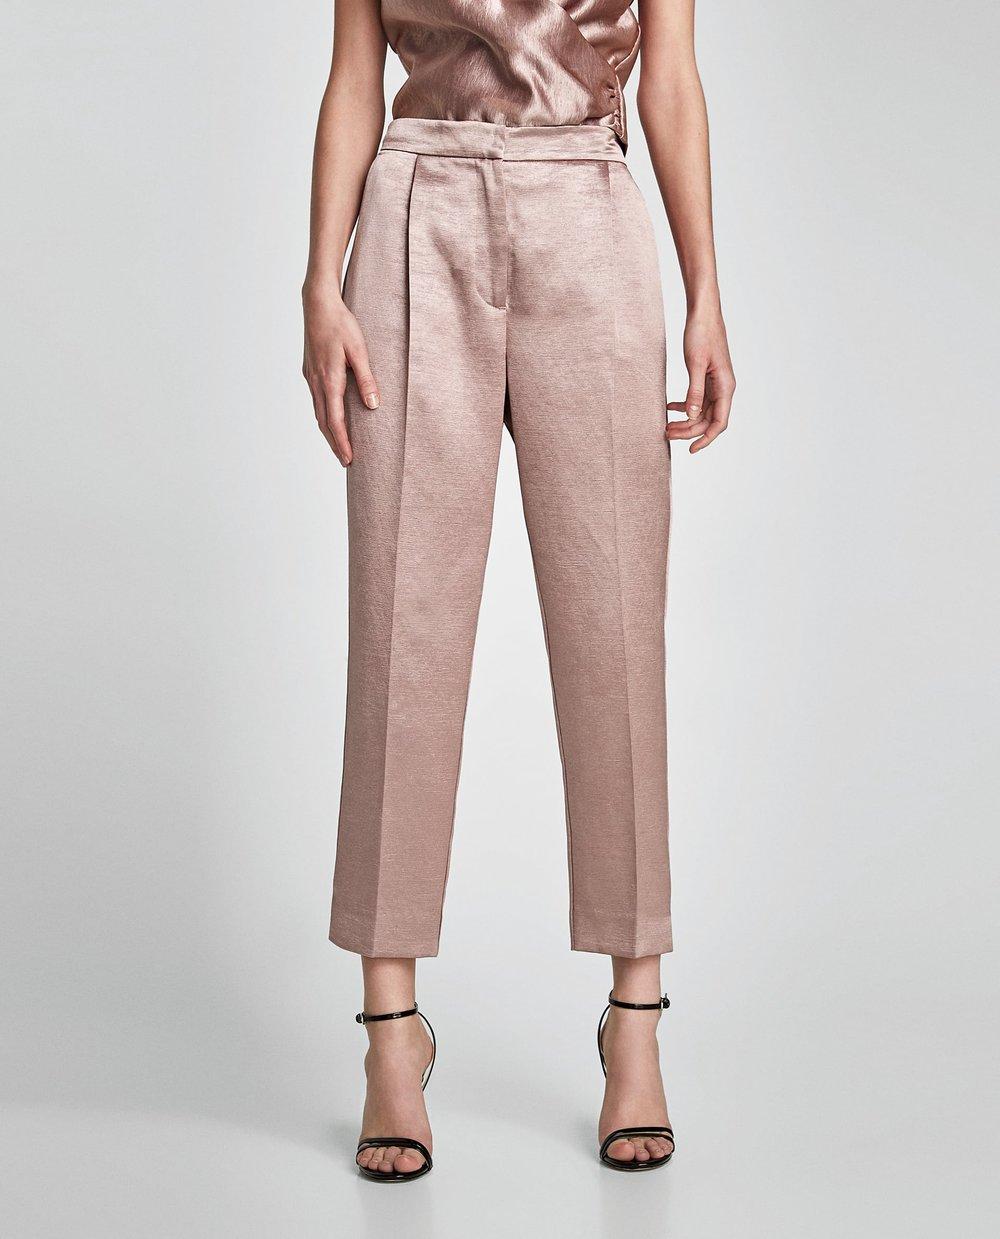 Pantalon Zara 39,95€